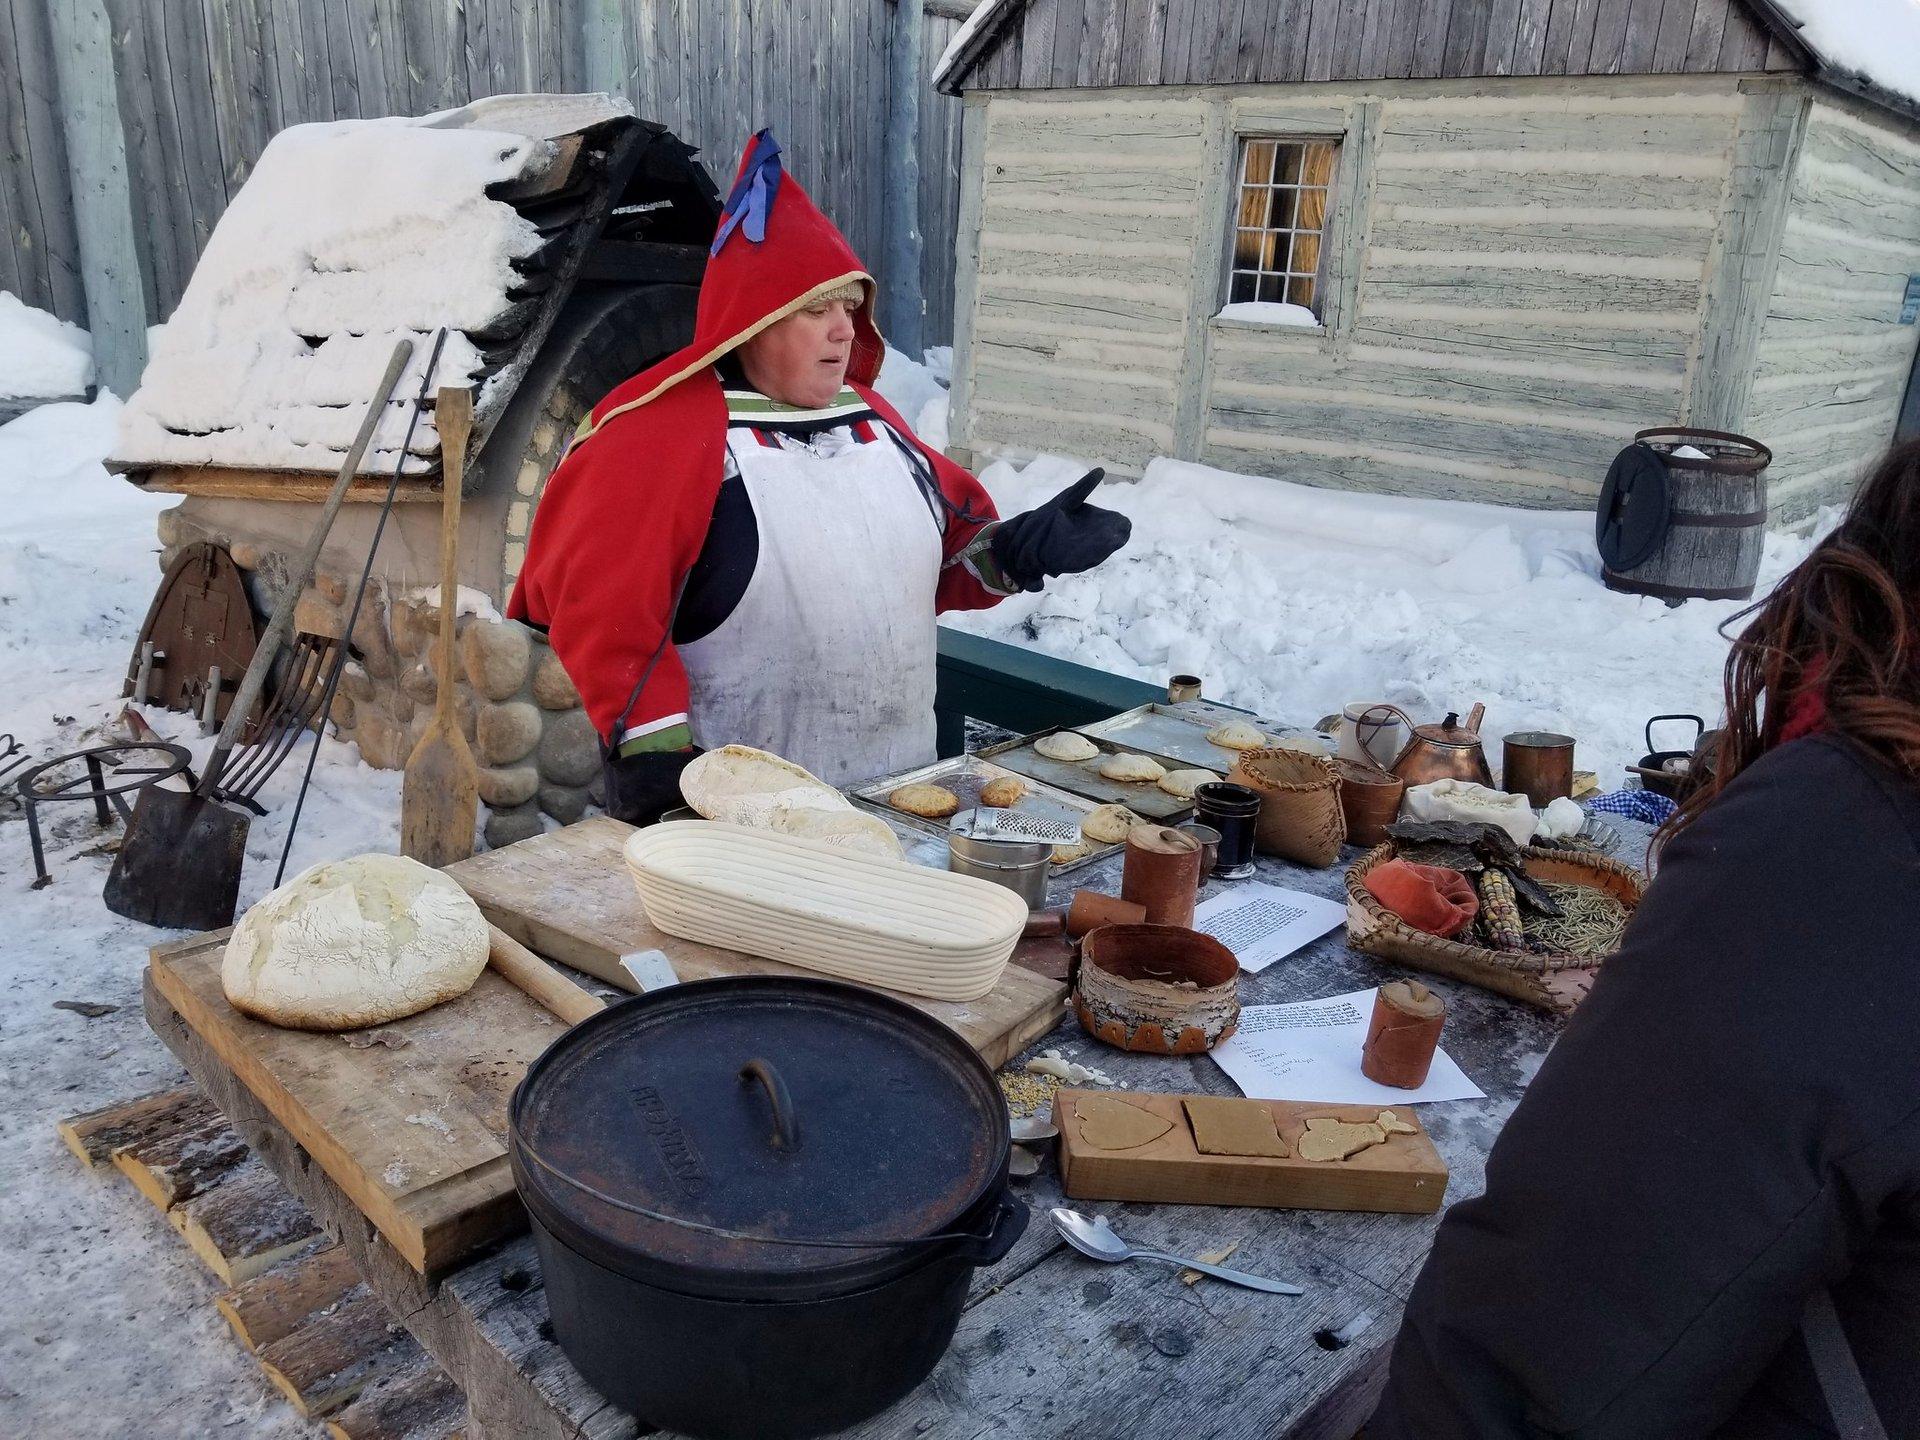 A lady explaining voyageur food at Festival du Voyageur in Winnipeg 2020